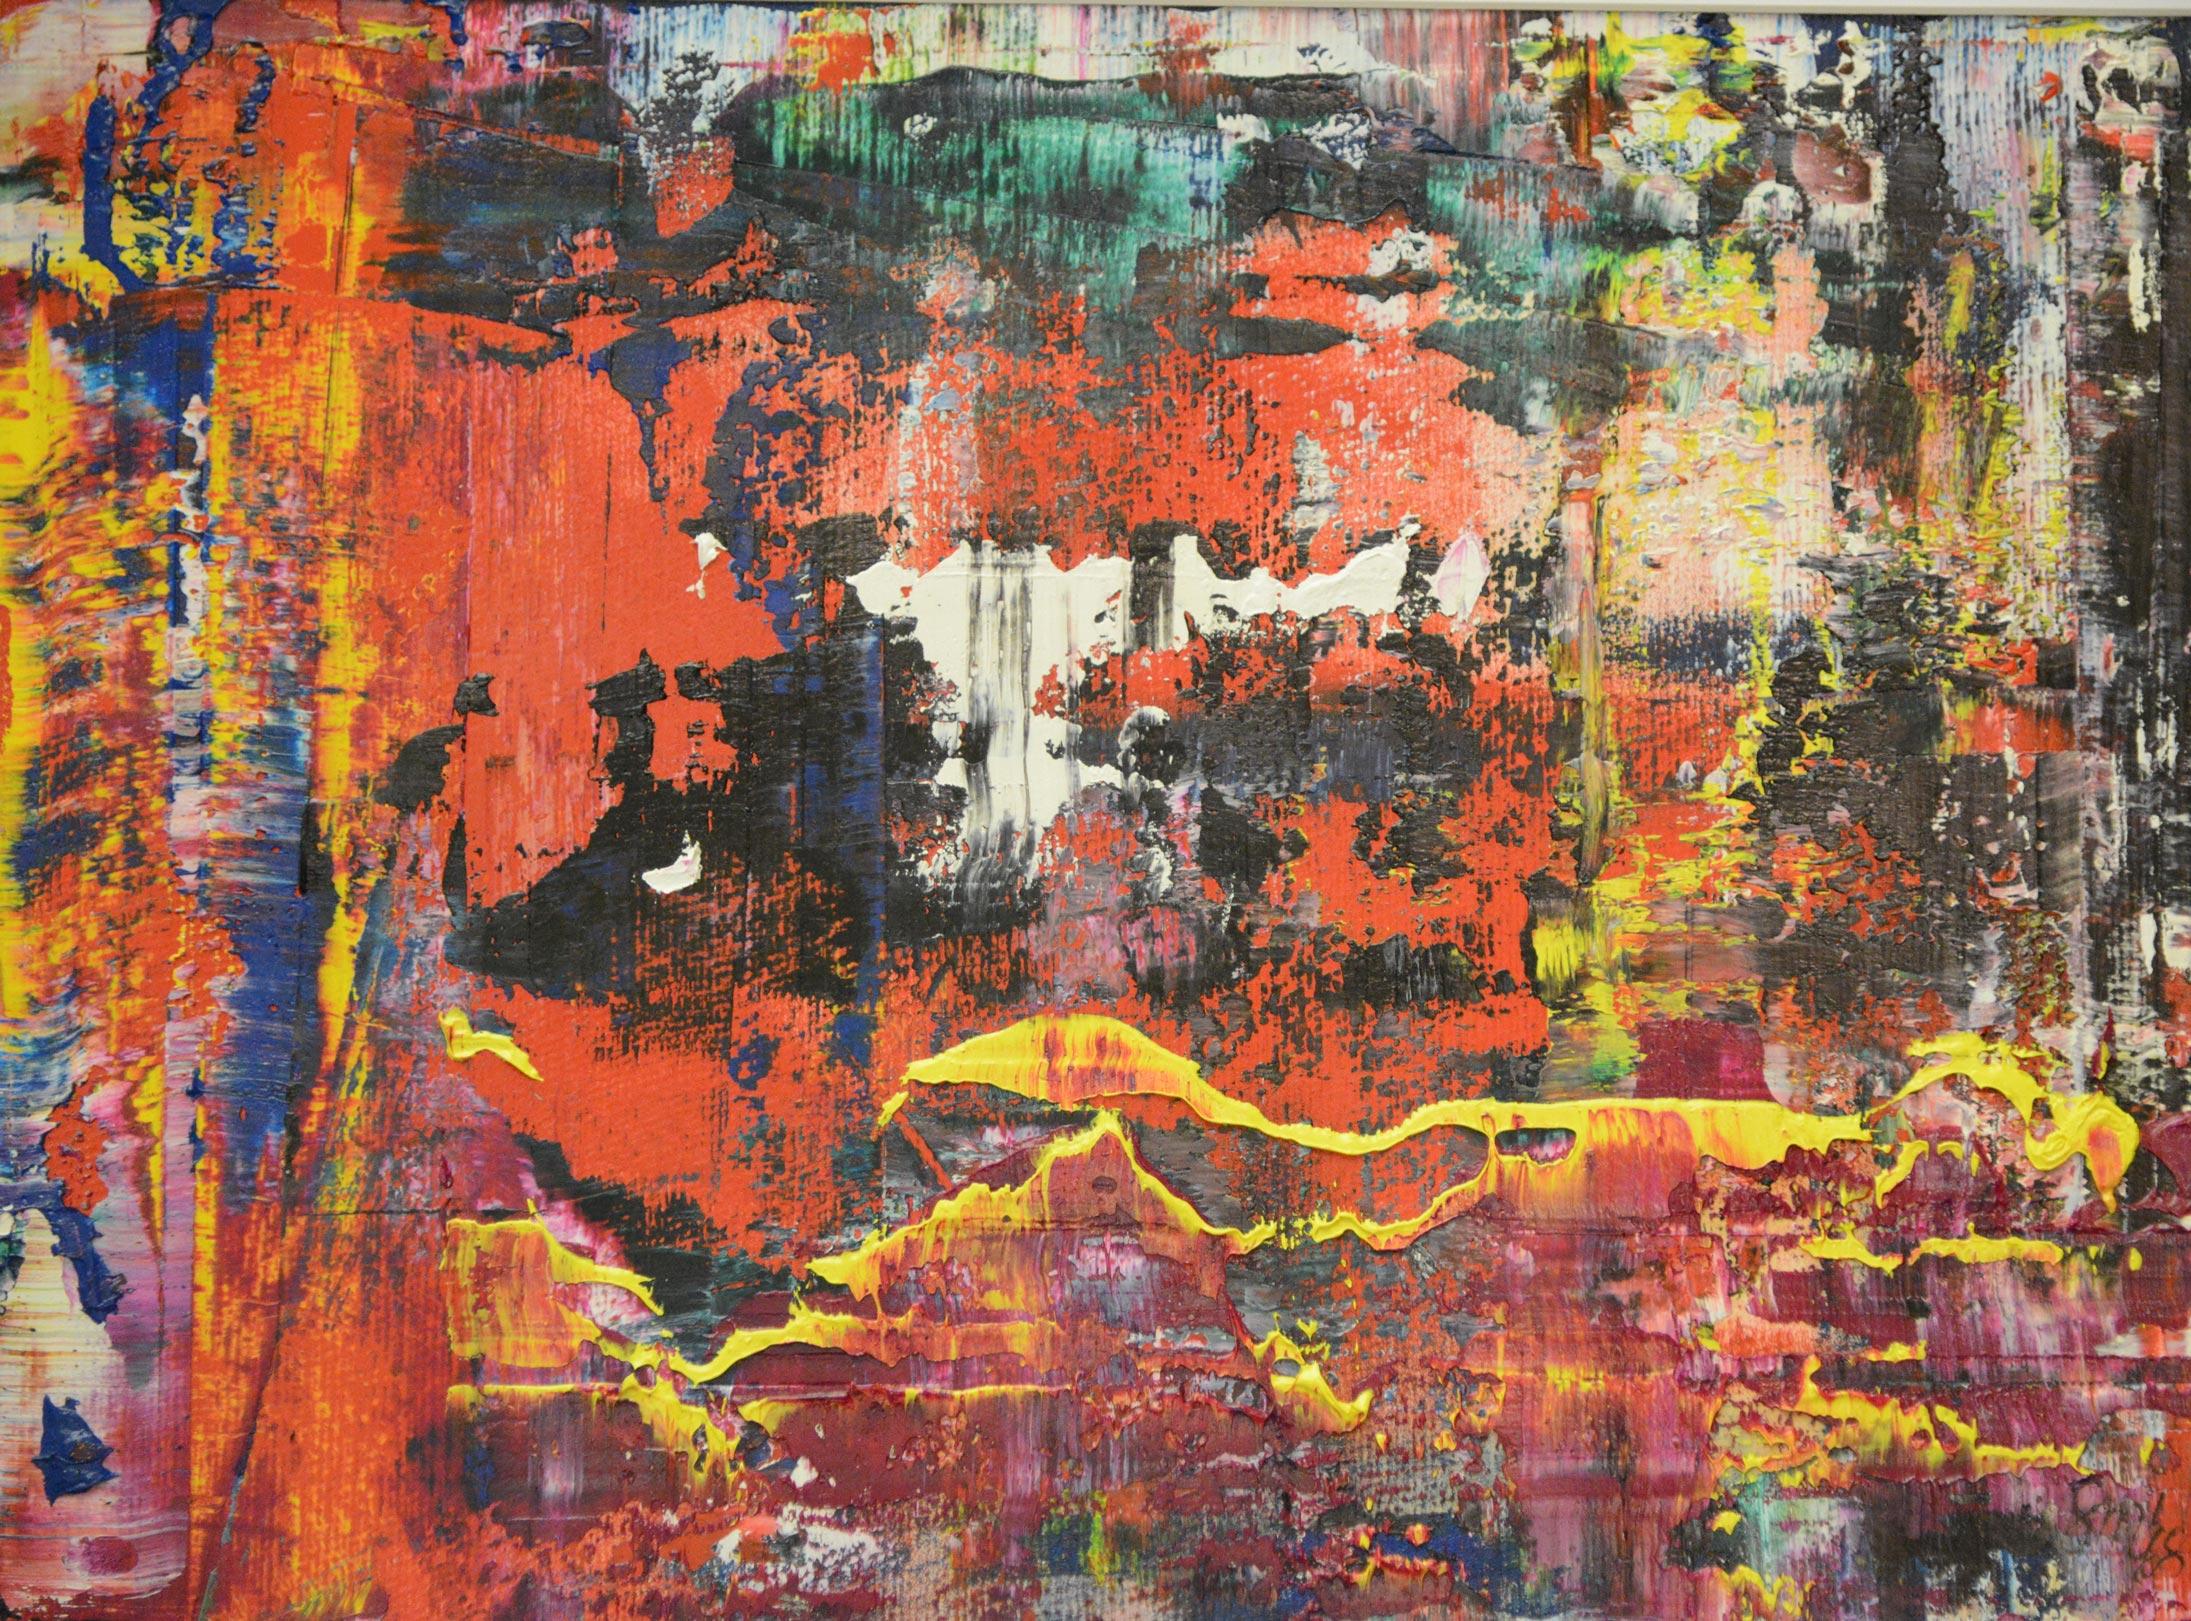 Abstrakte Komposition 9 | Öl auf Leinwand